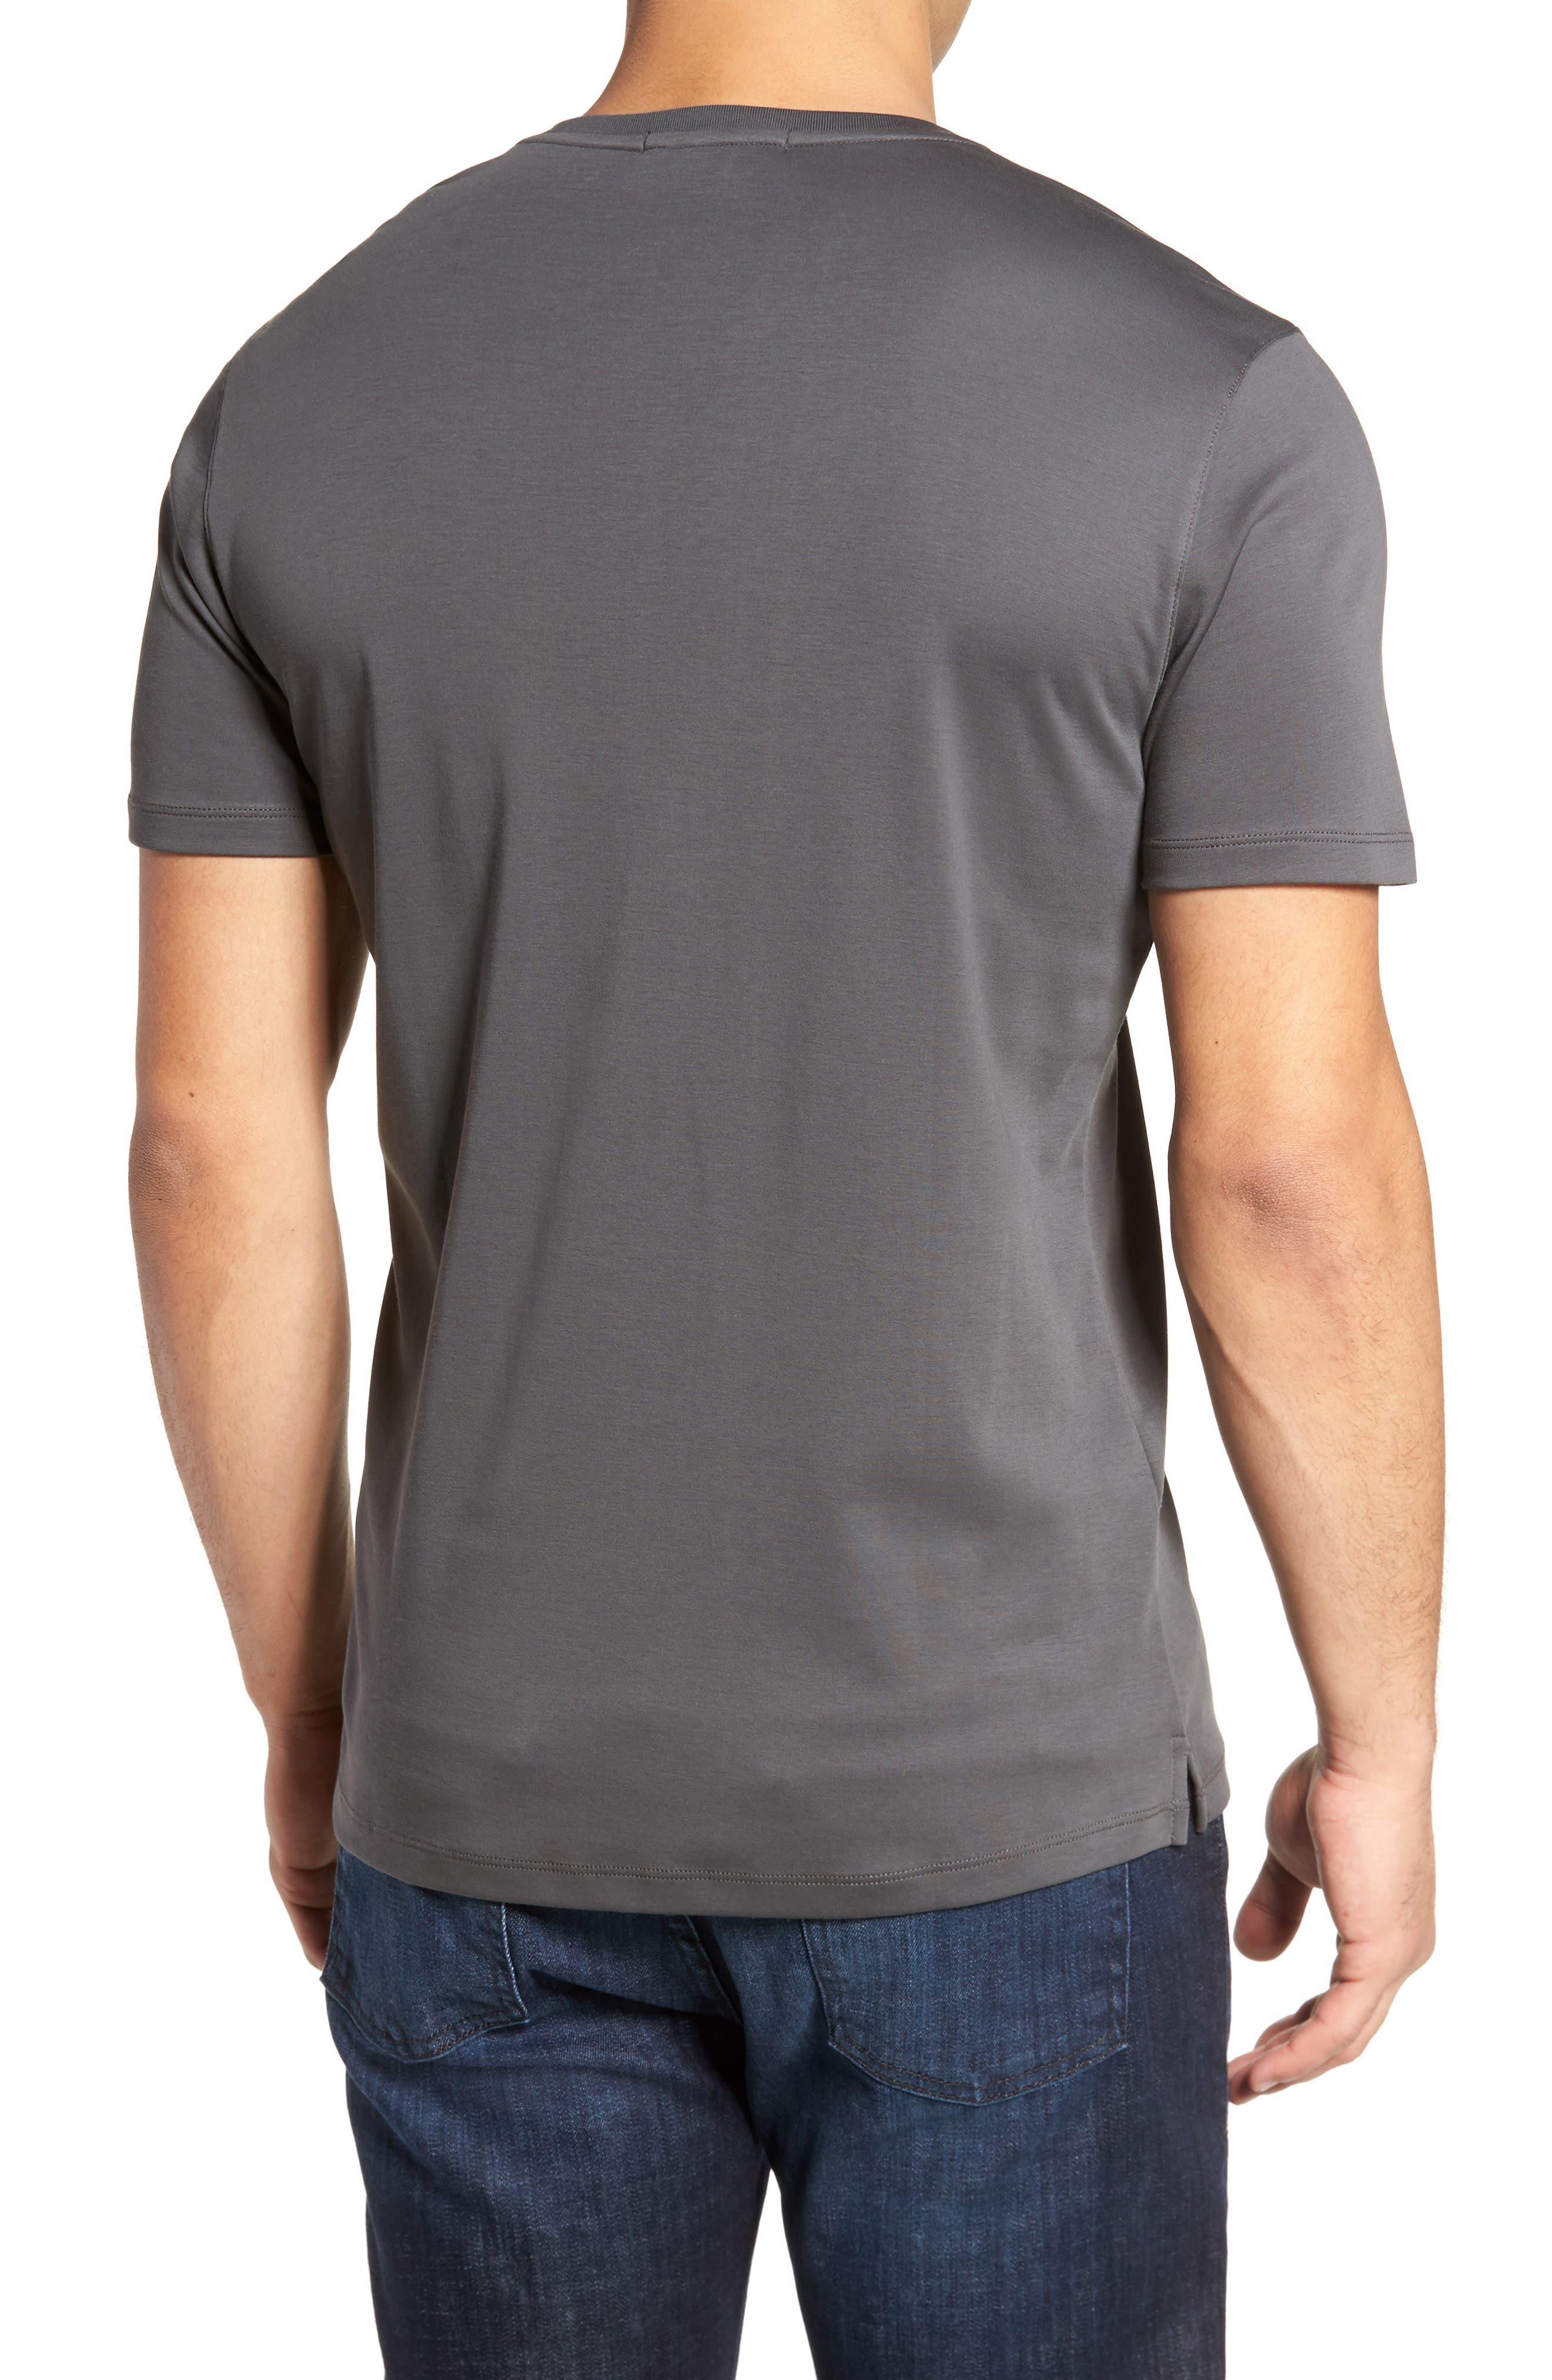 ROBERT BARAKETT, Georgia Regular Fit V-Neck T-Shirt, Alternate thumbnail 2, color, IRON